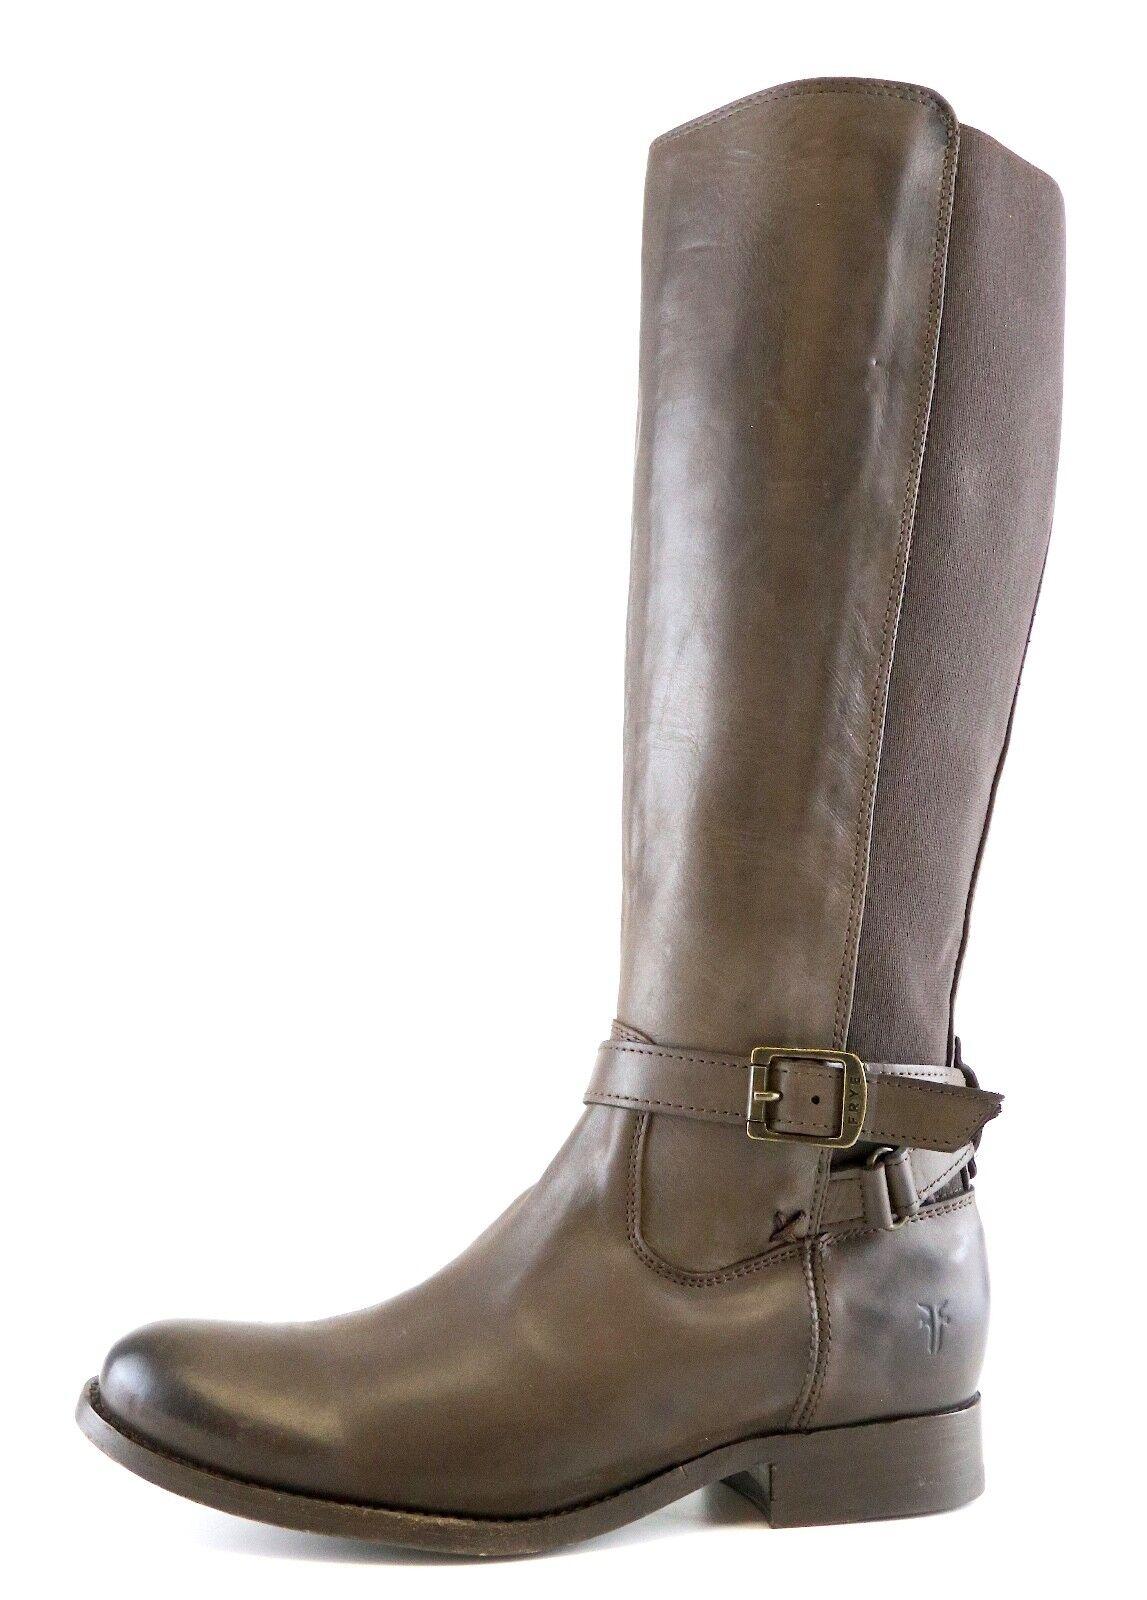 Frye Melissa Gore Leather Boot Brown Women Sz 7 B 6805 *